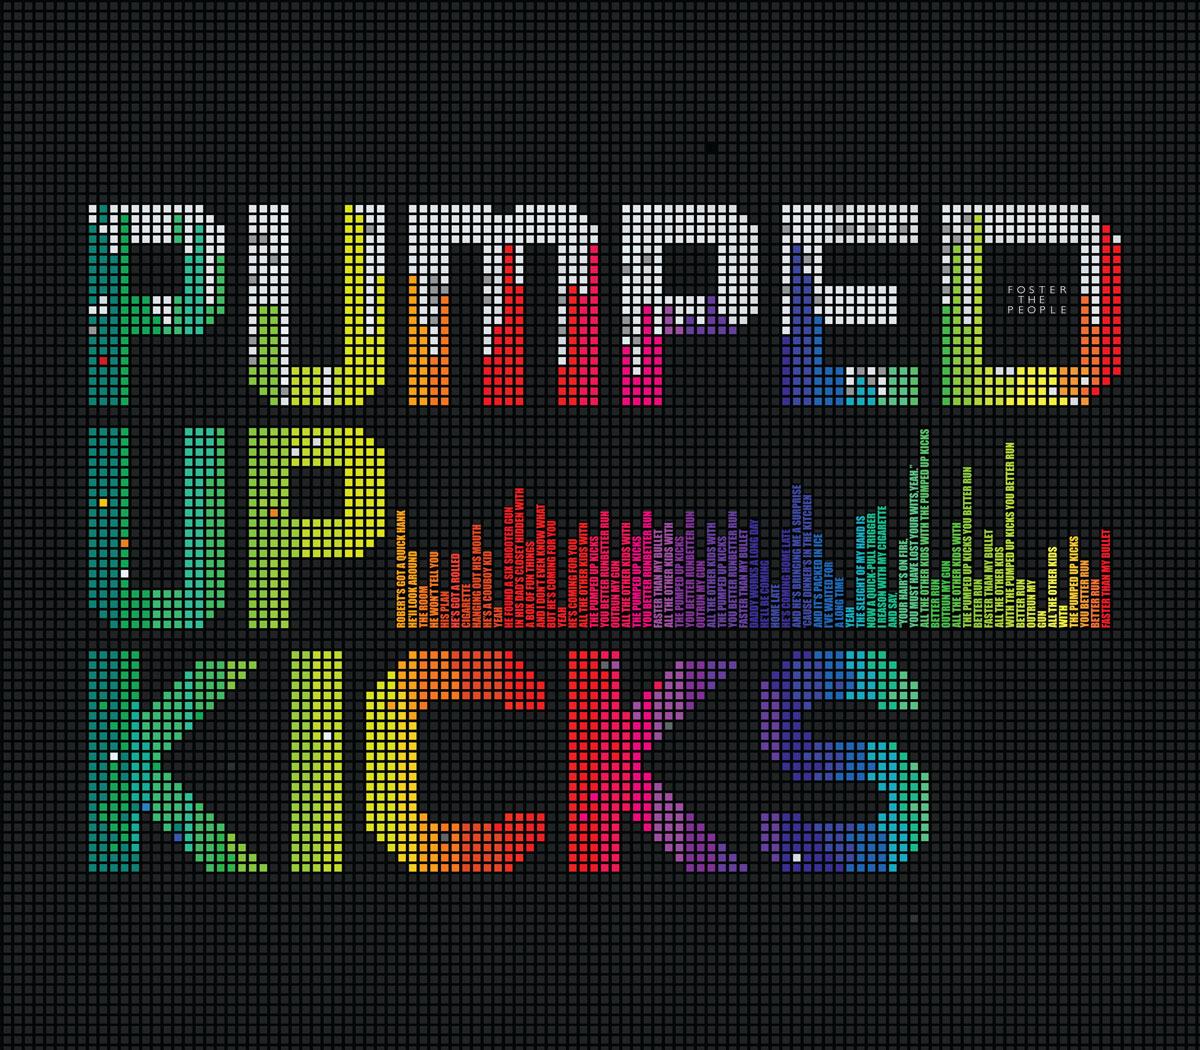 pumped-up-kicks-FINAL.jpg